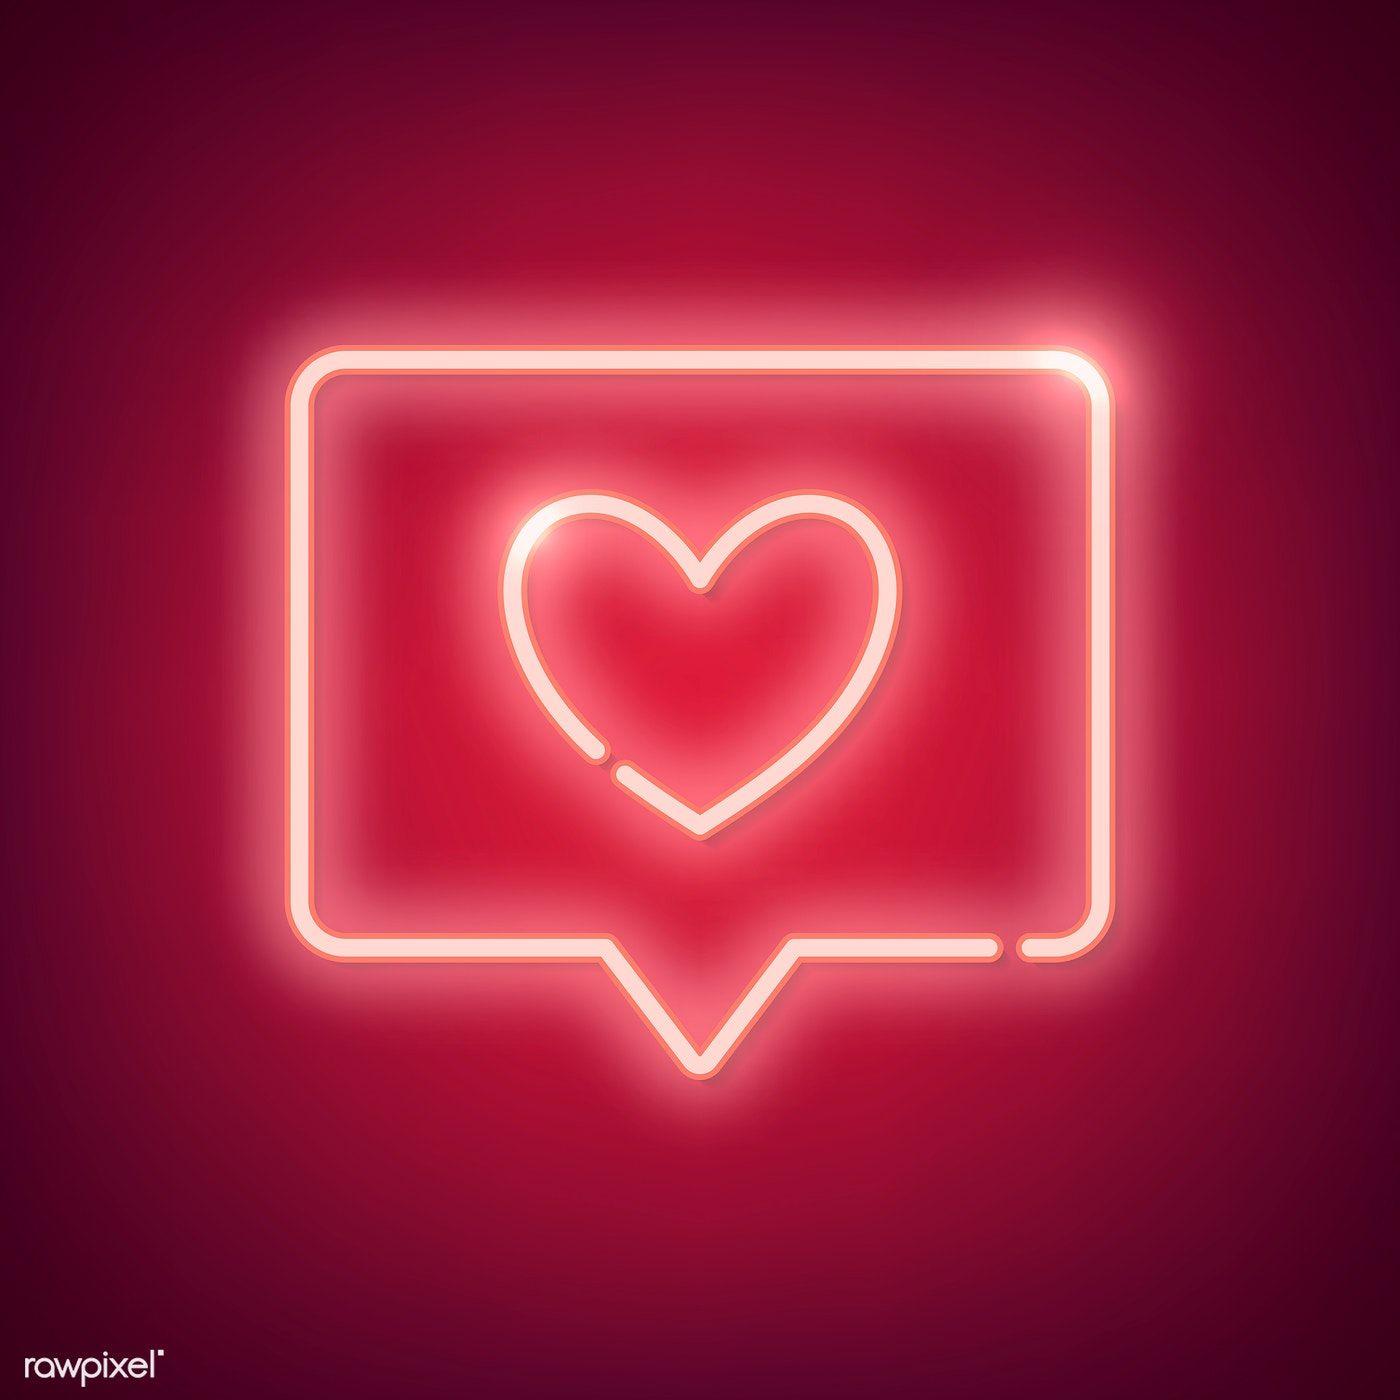 Neon pink light Valentine's day symbol on background